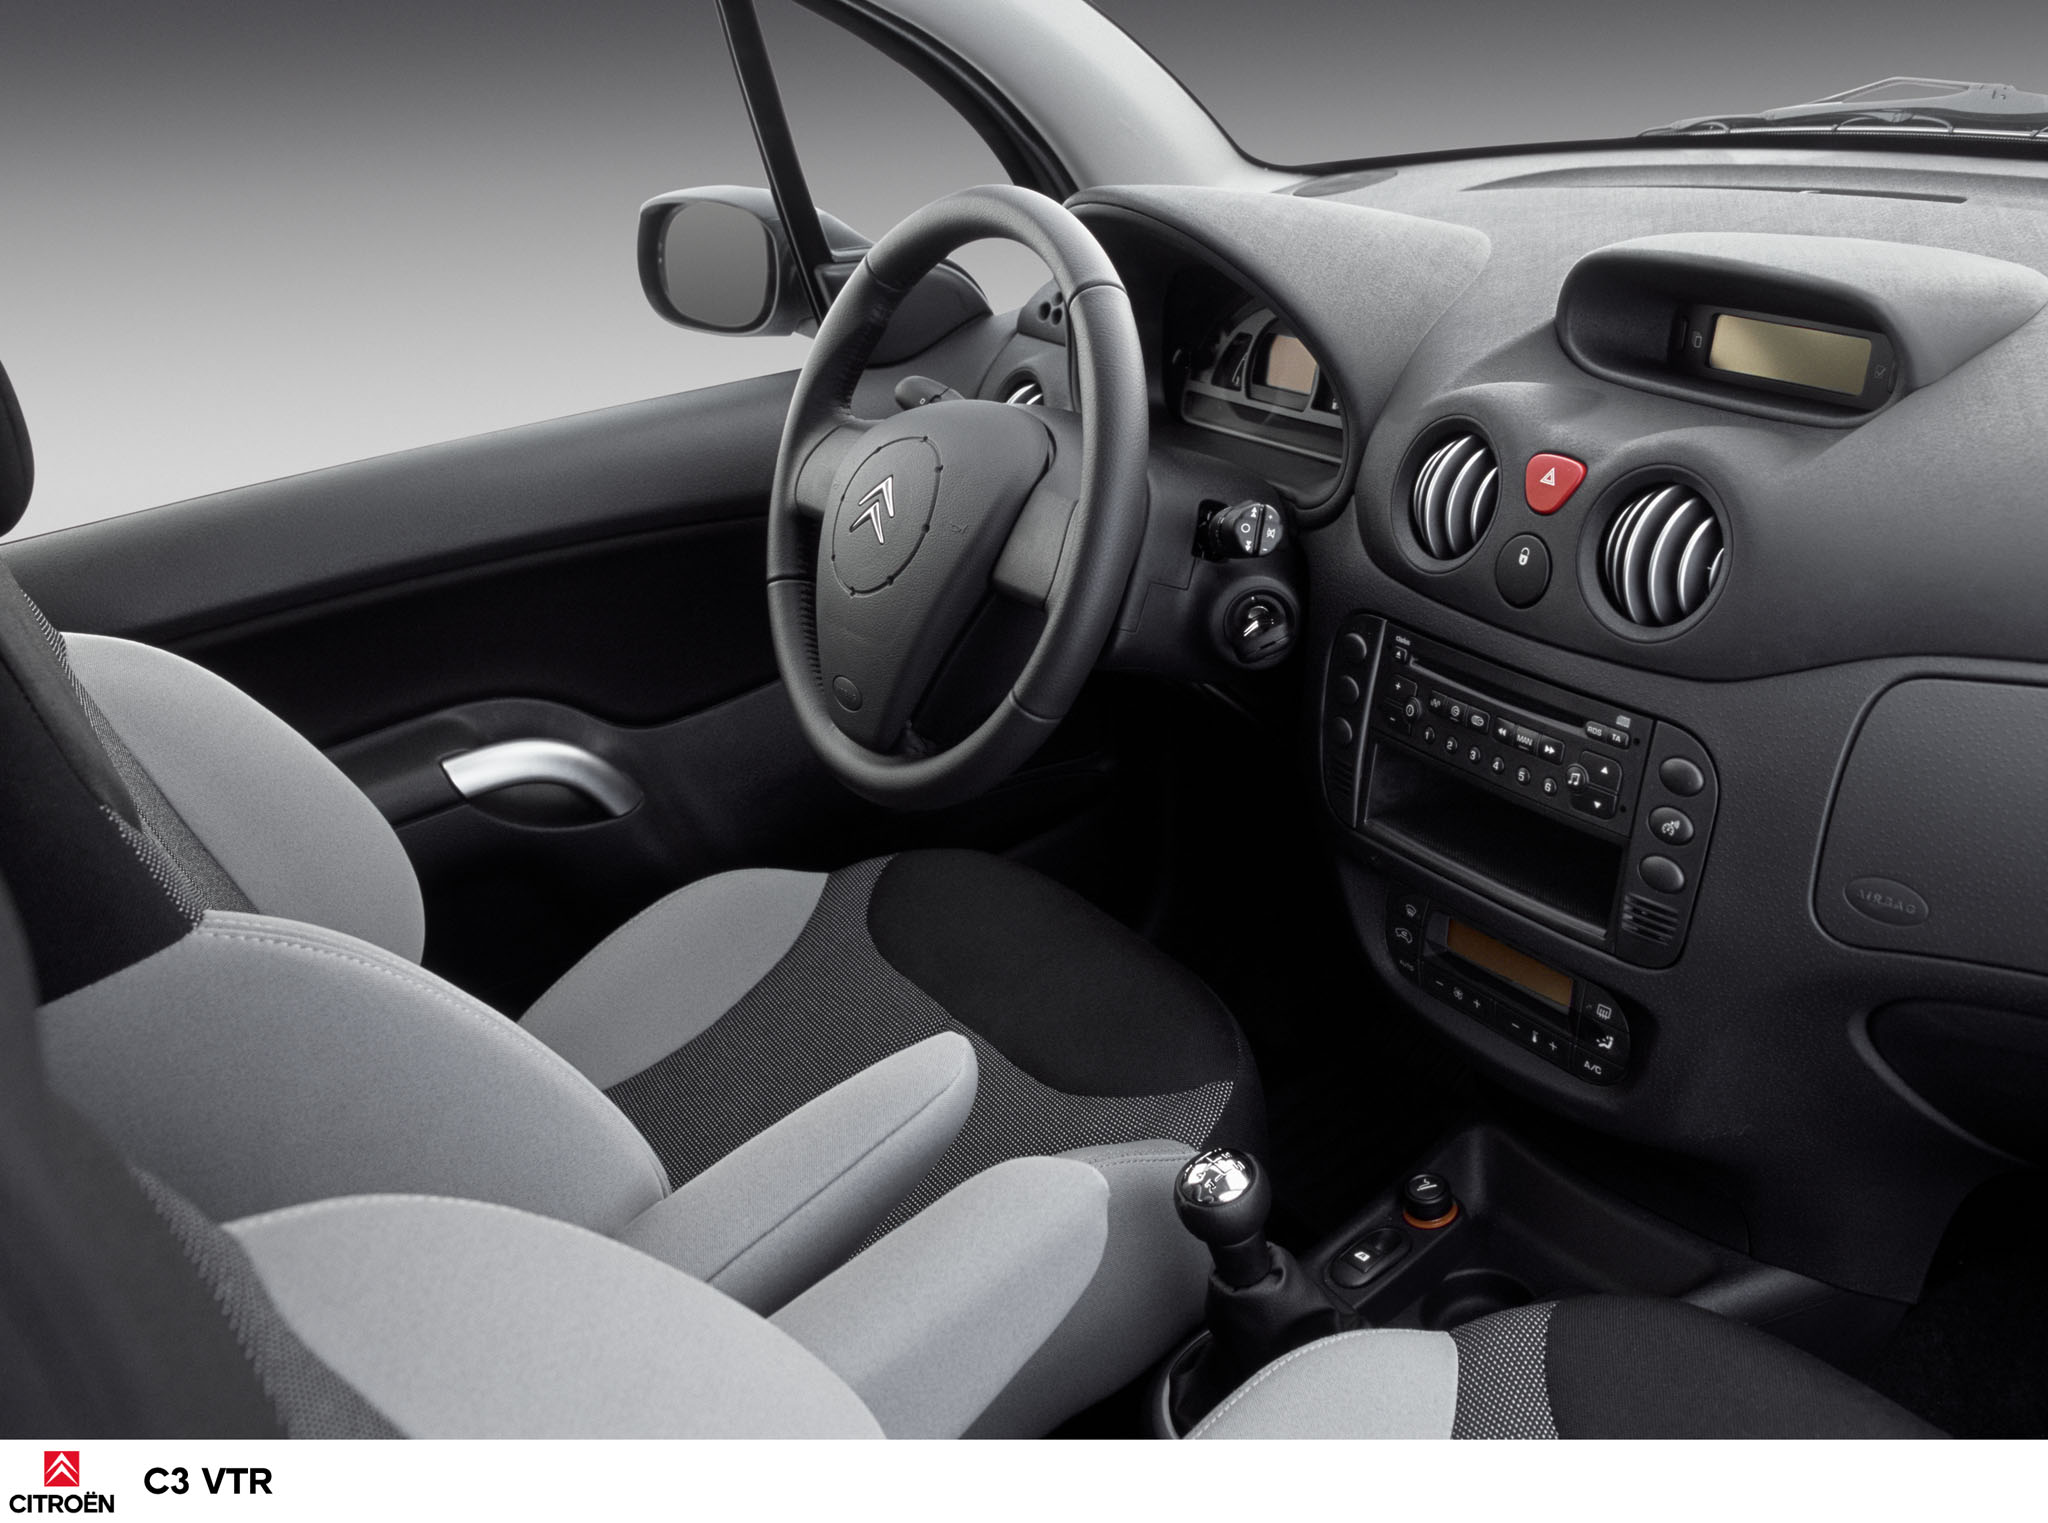 Citroën C3 VTR